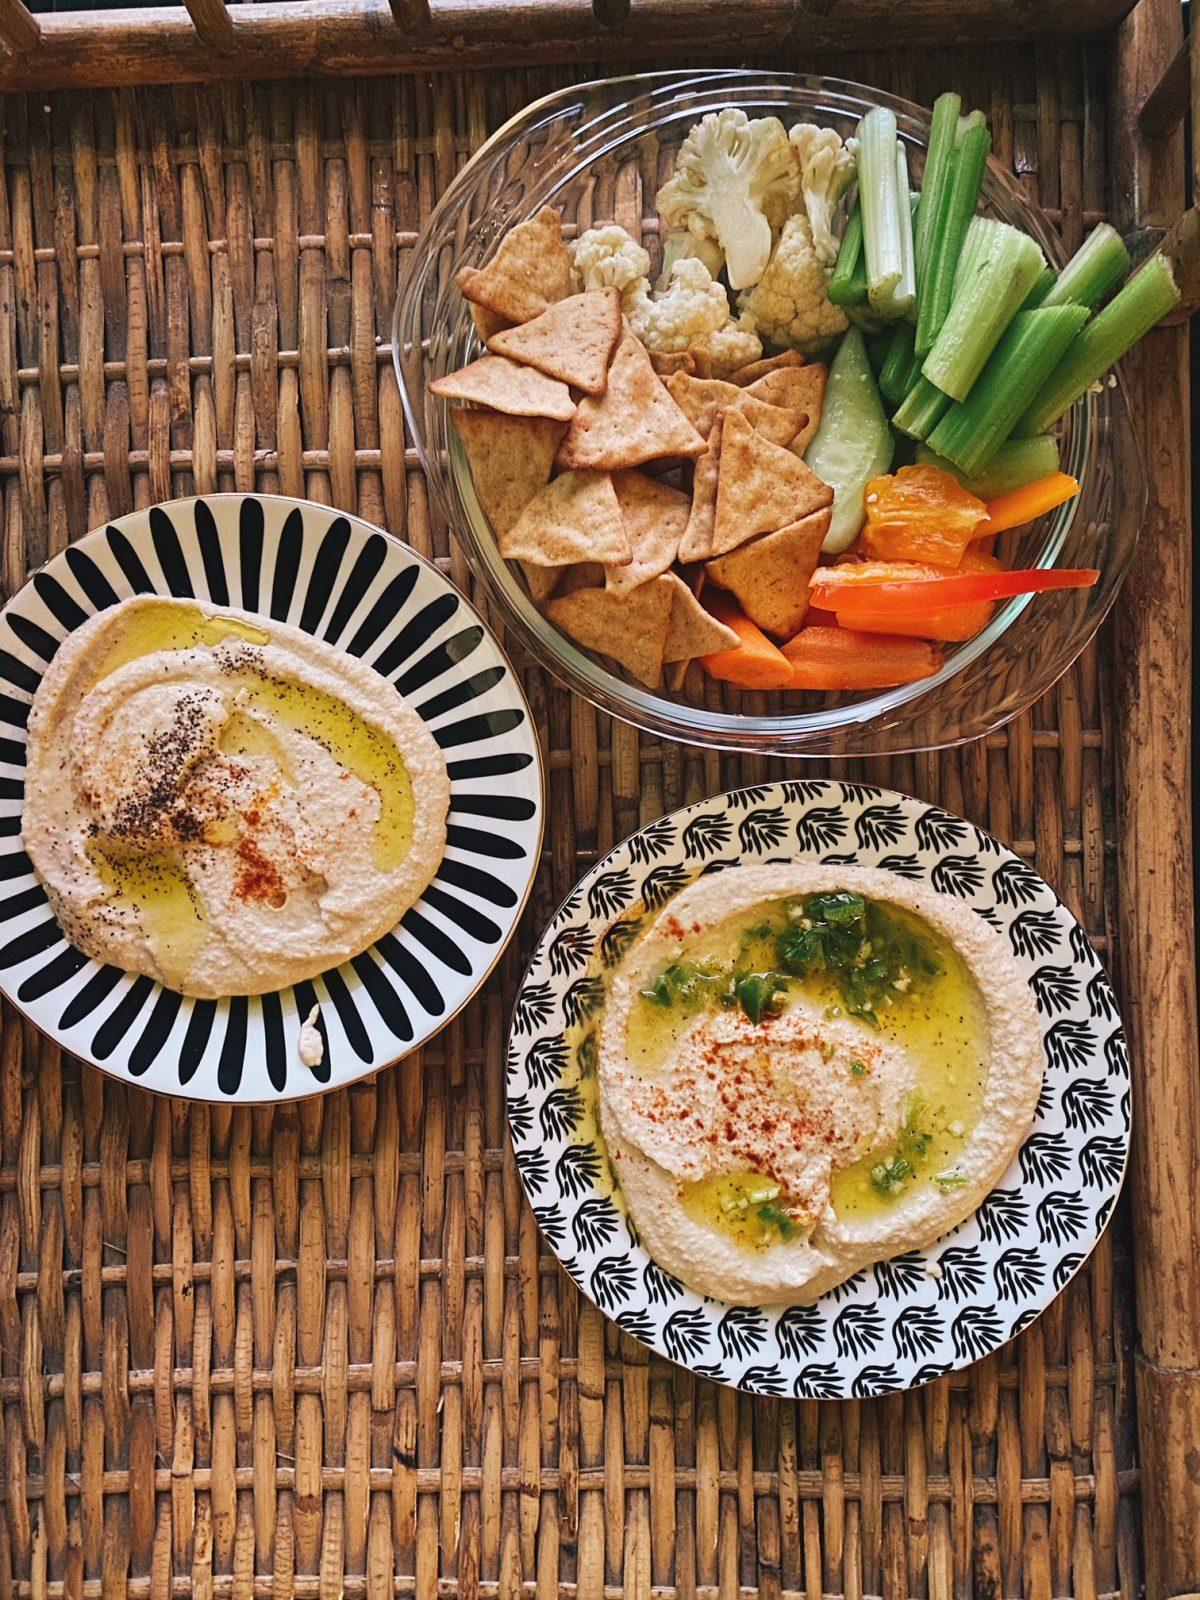 Creamy Tahini Hummus with Jalapeño Vinaigrette